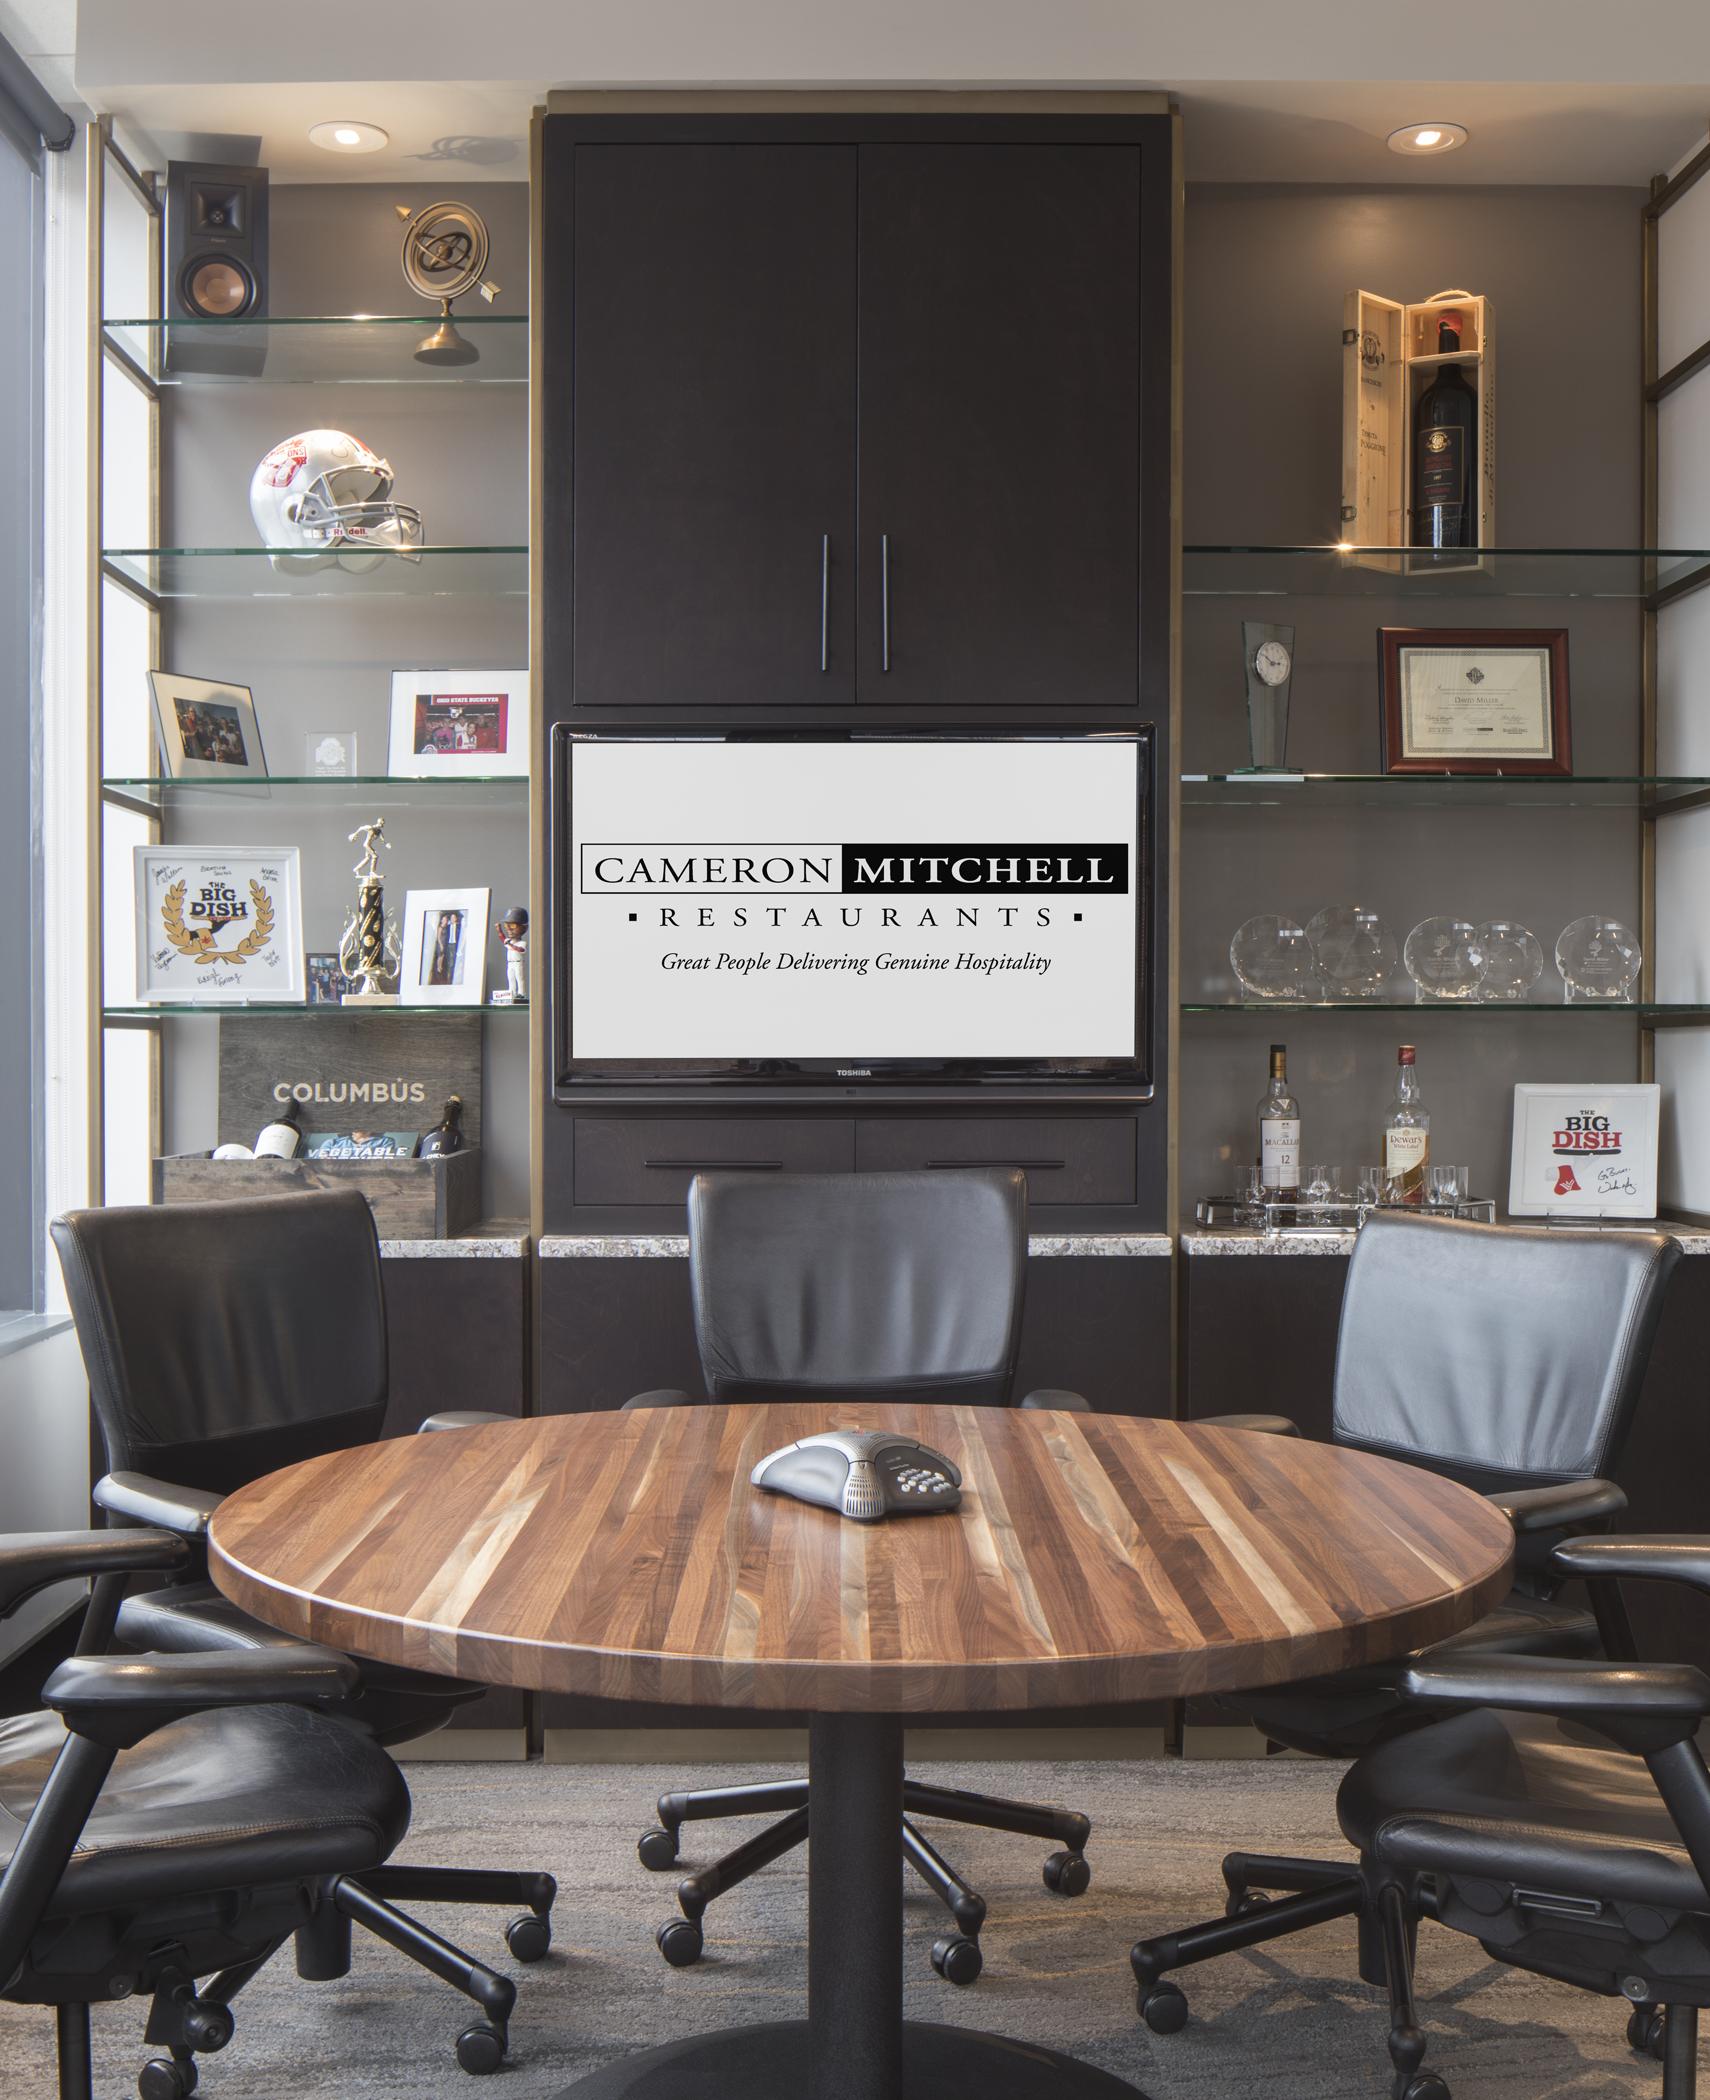 Cameron Mitchell Restaurants Headquarters Design Collective